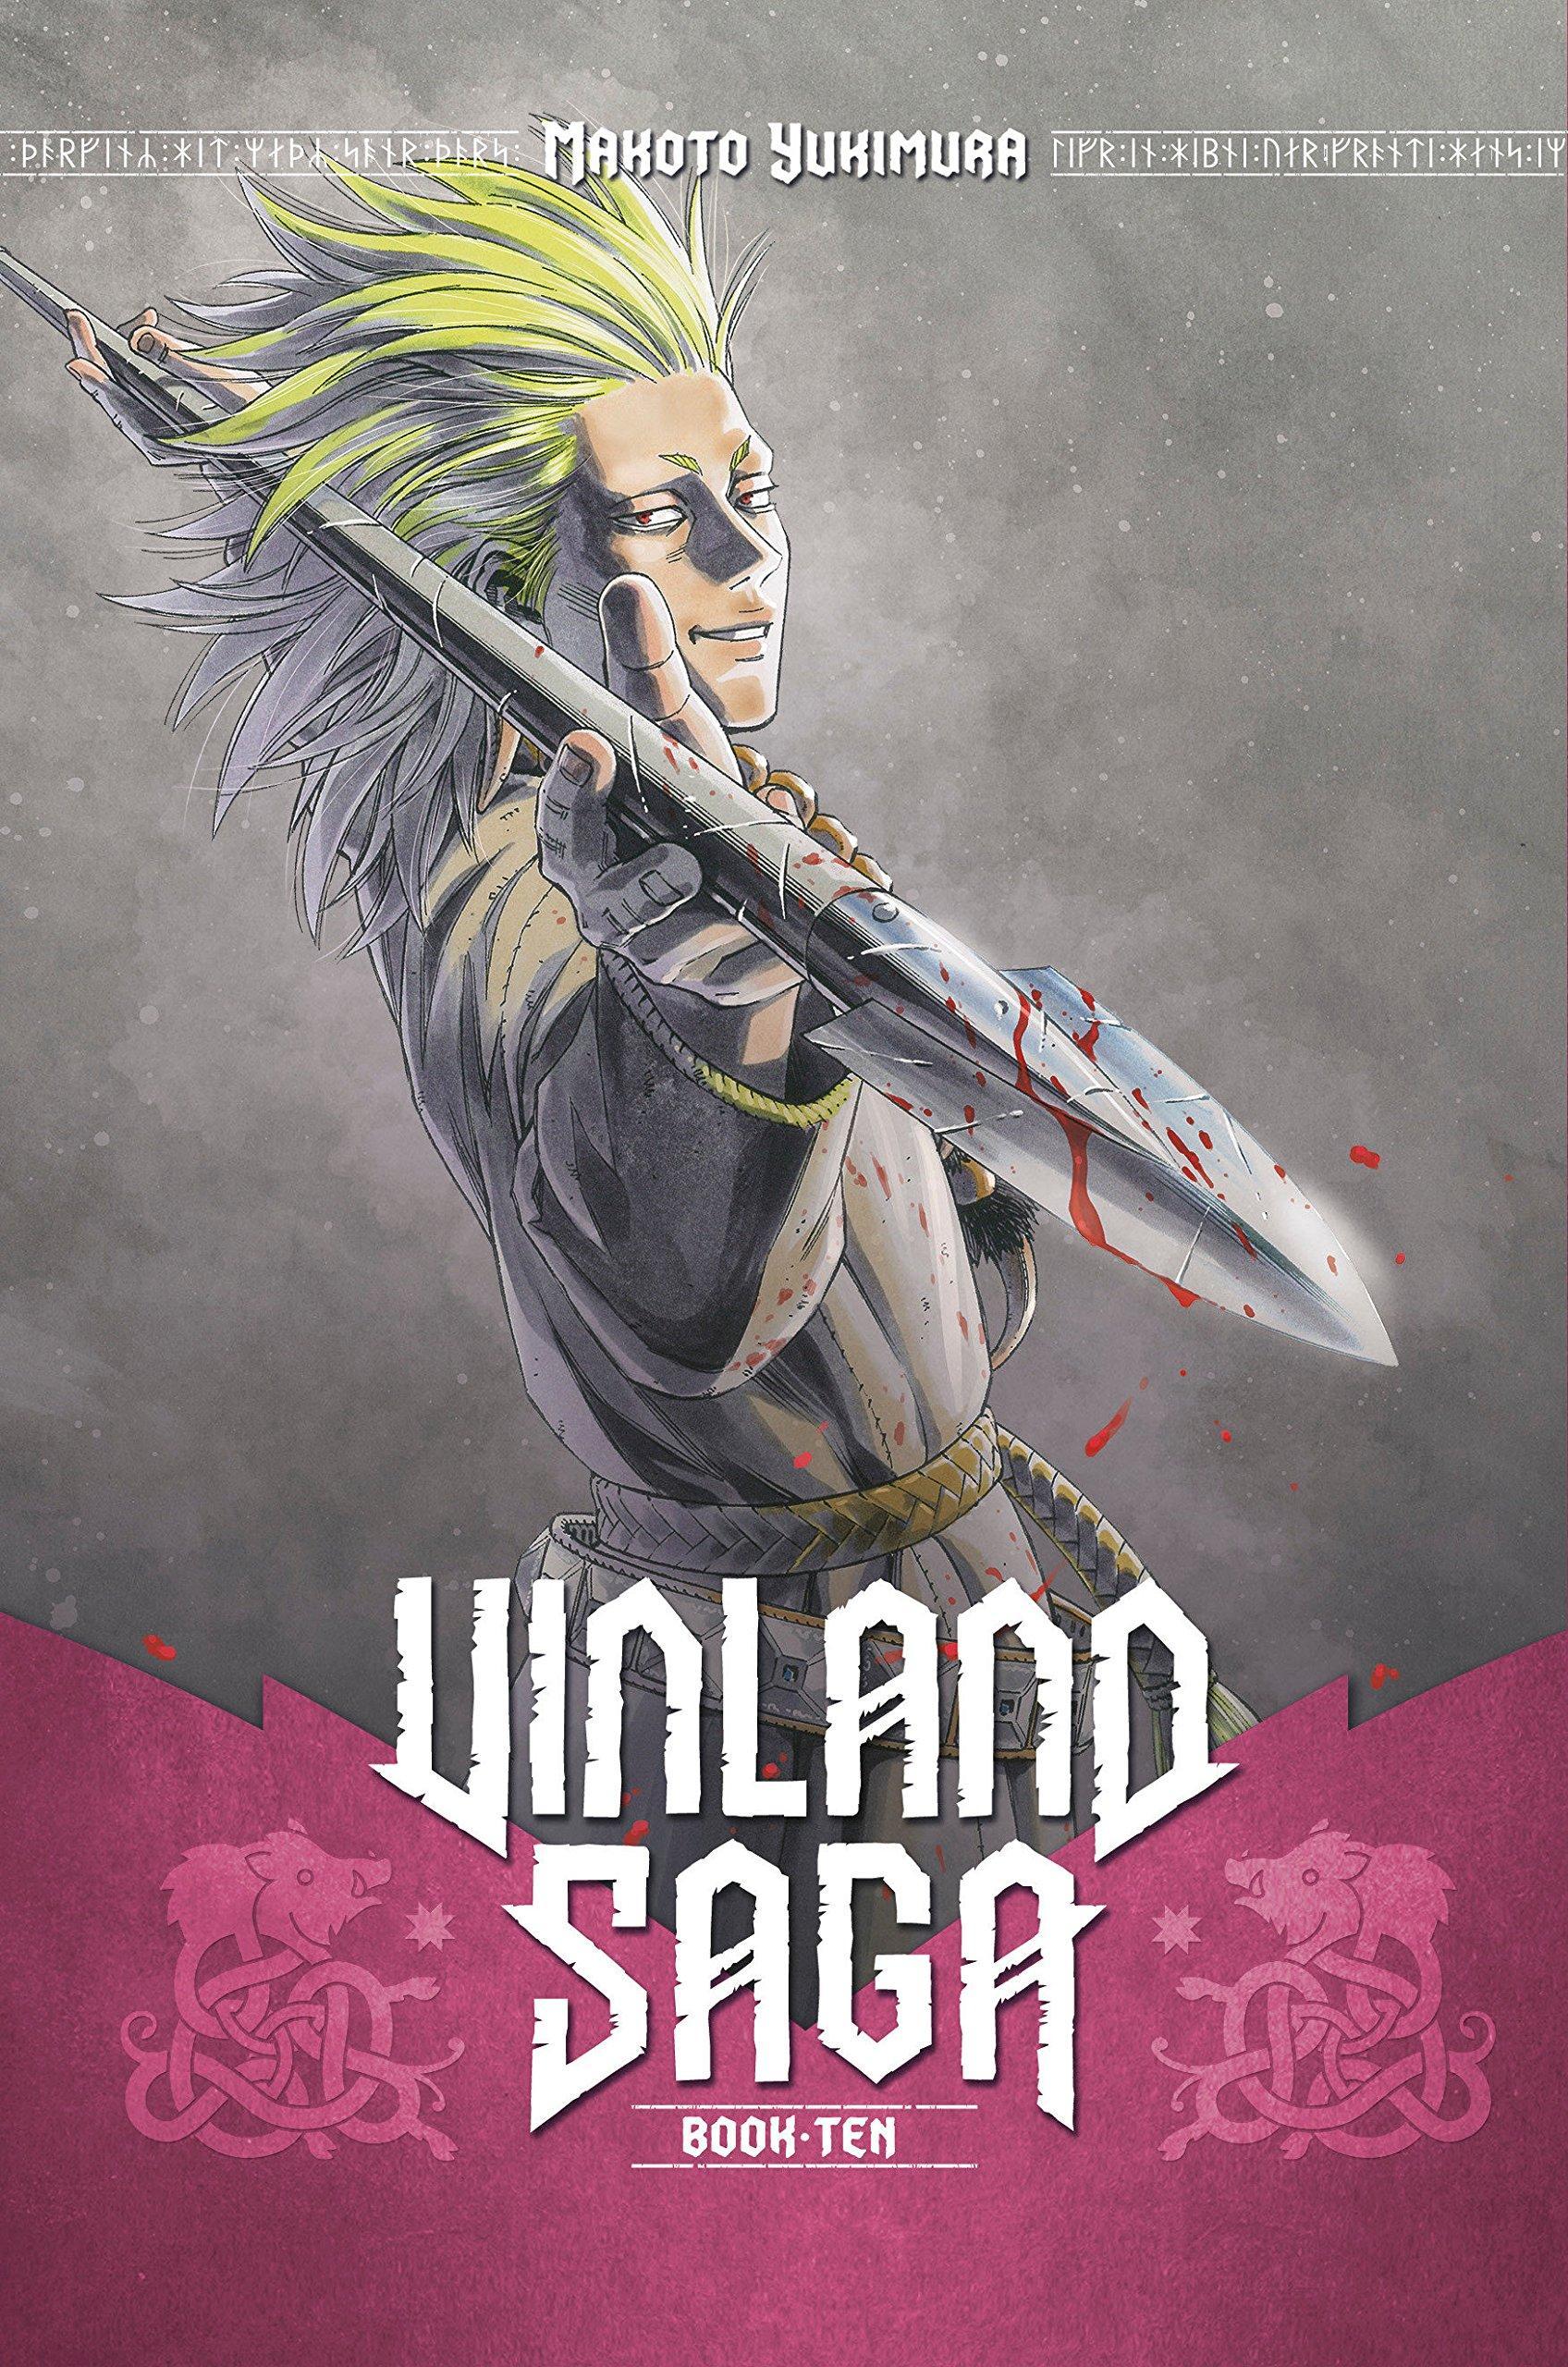 Vinland Saga Android Wallpapers - Wallpaper Cave